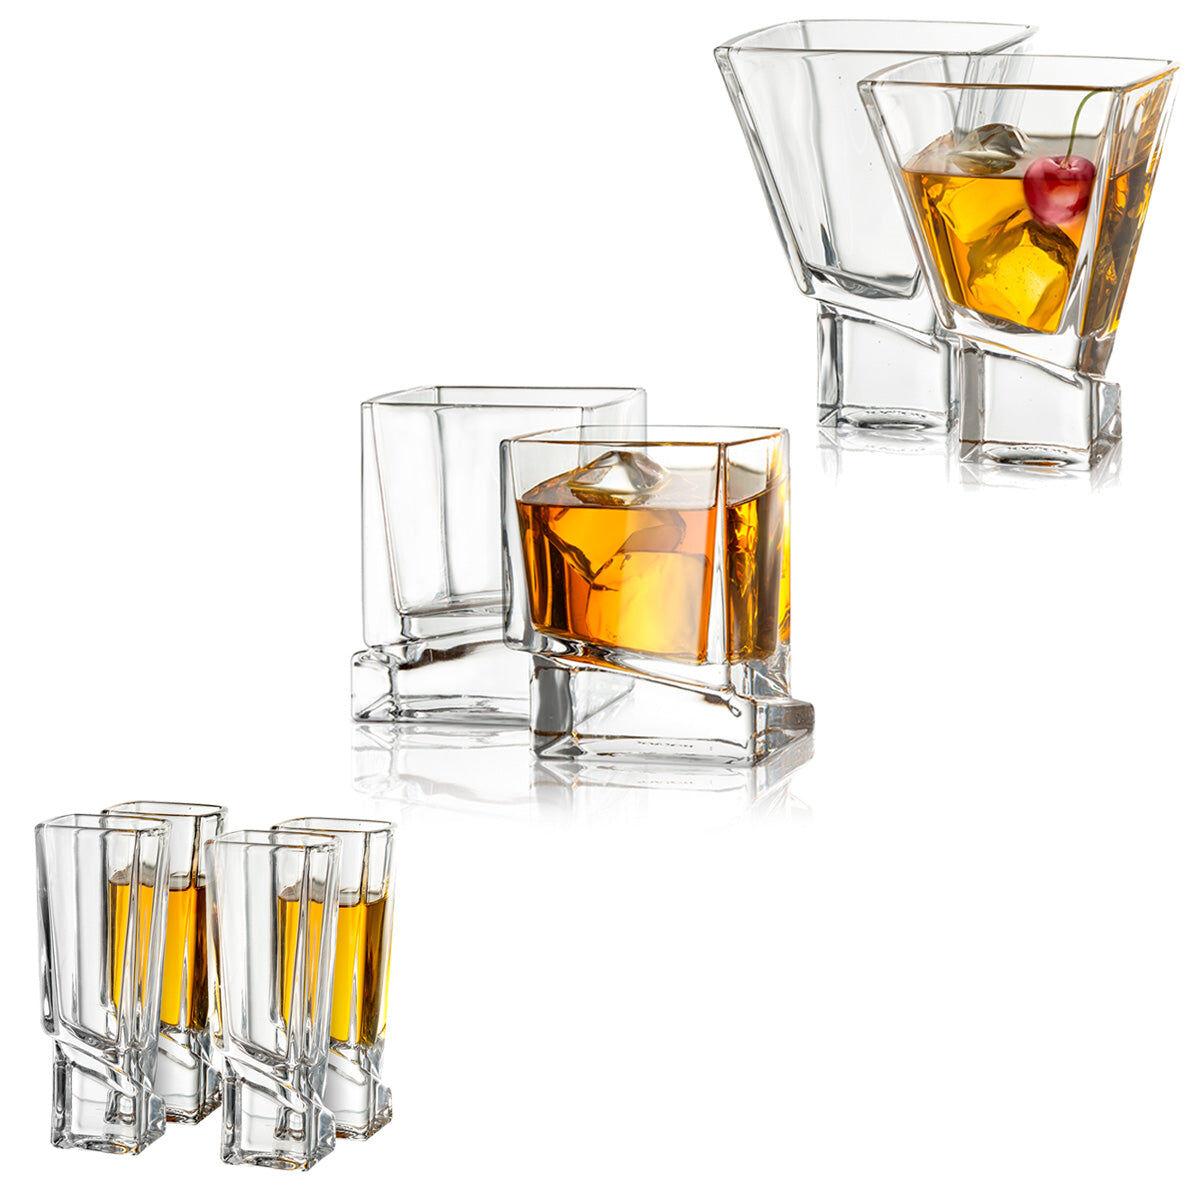 JoyJolt Carre Collection Drinkware Set